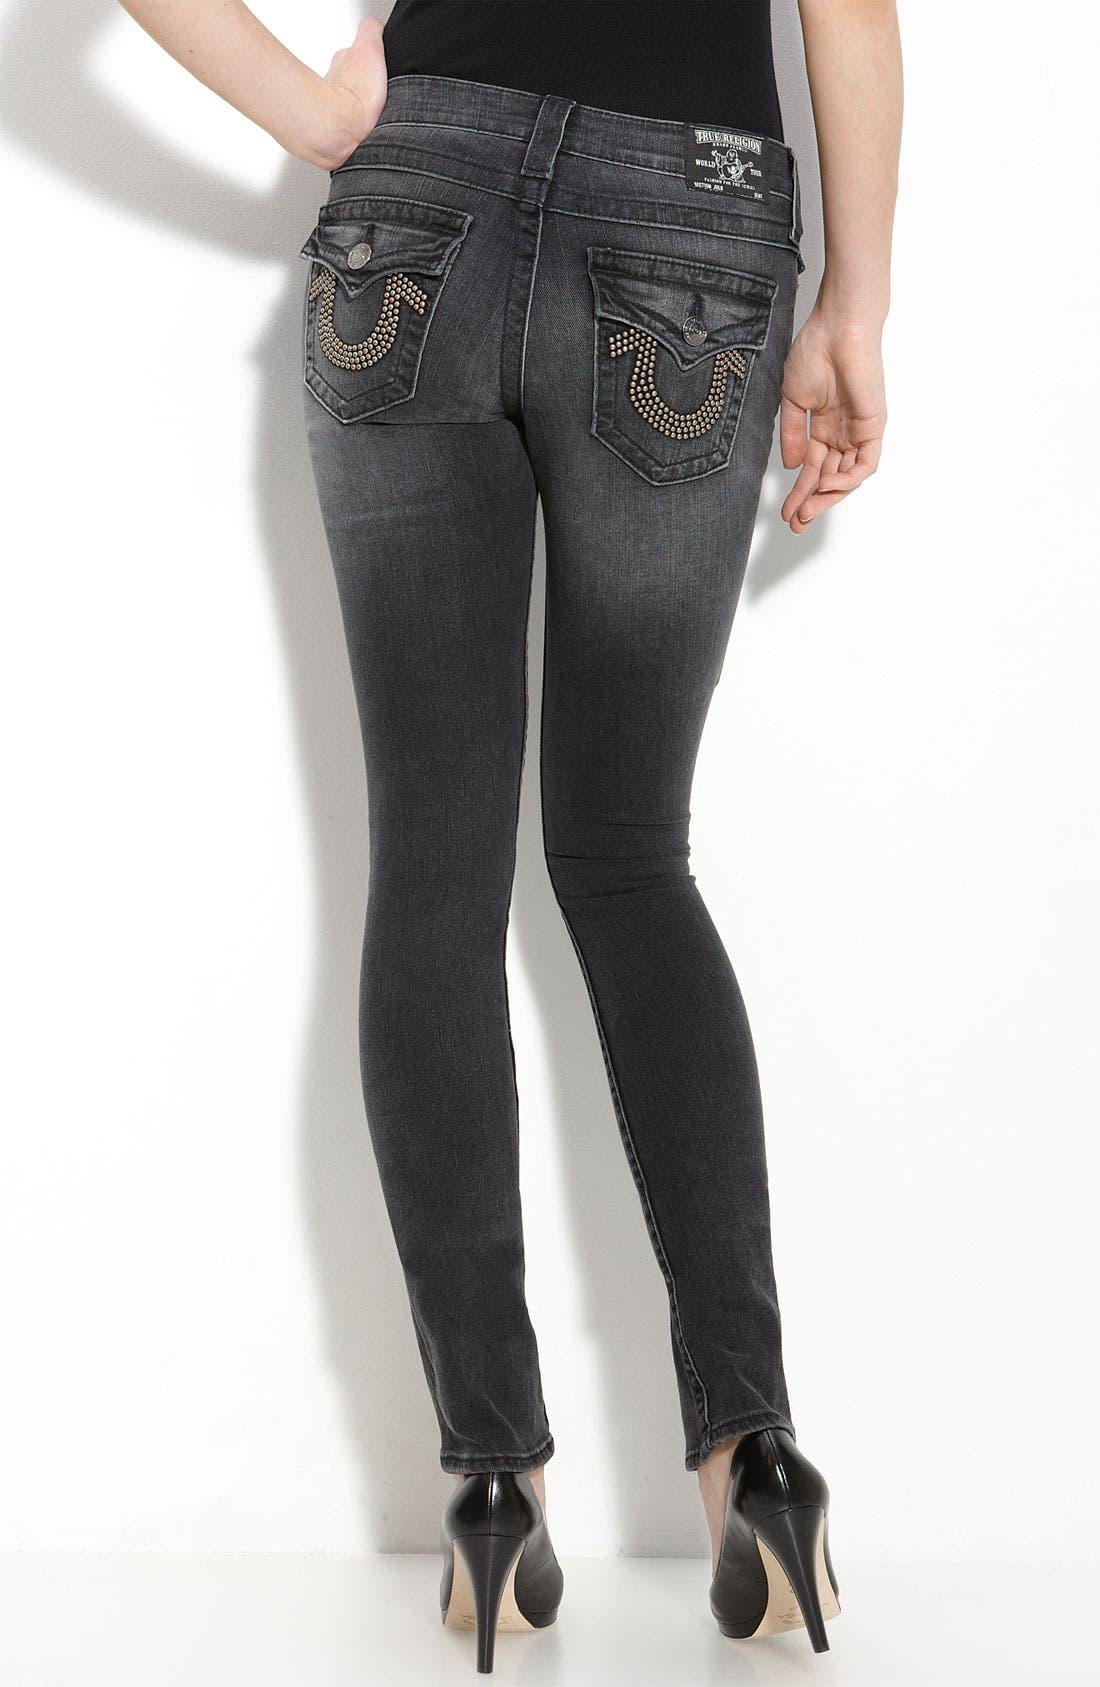 Alternate Image 1 Selected - True Religion Brand Jeans 'Julie' Skinny Stretch Jeans (Short Fuse Wash)